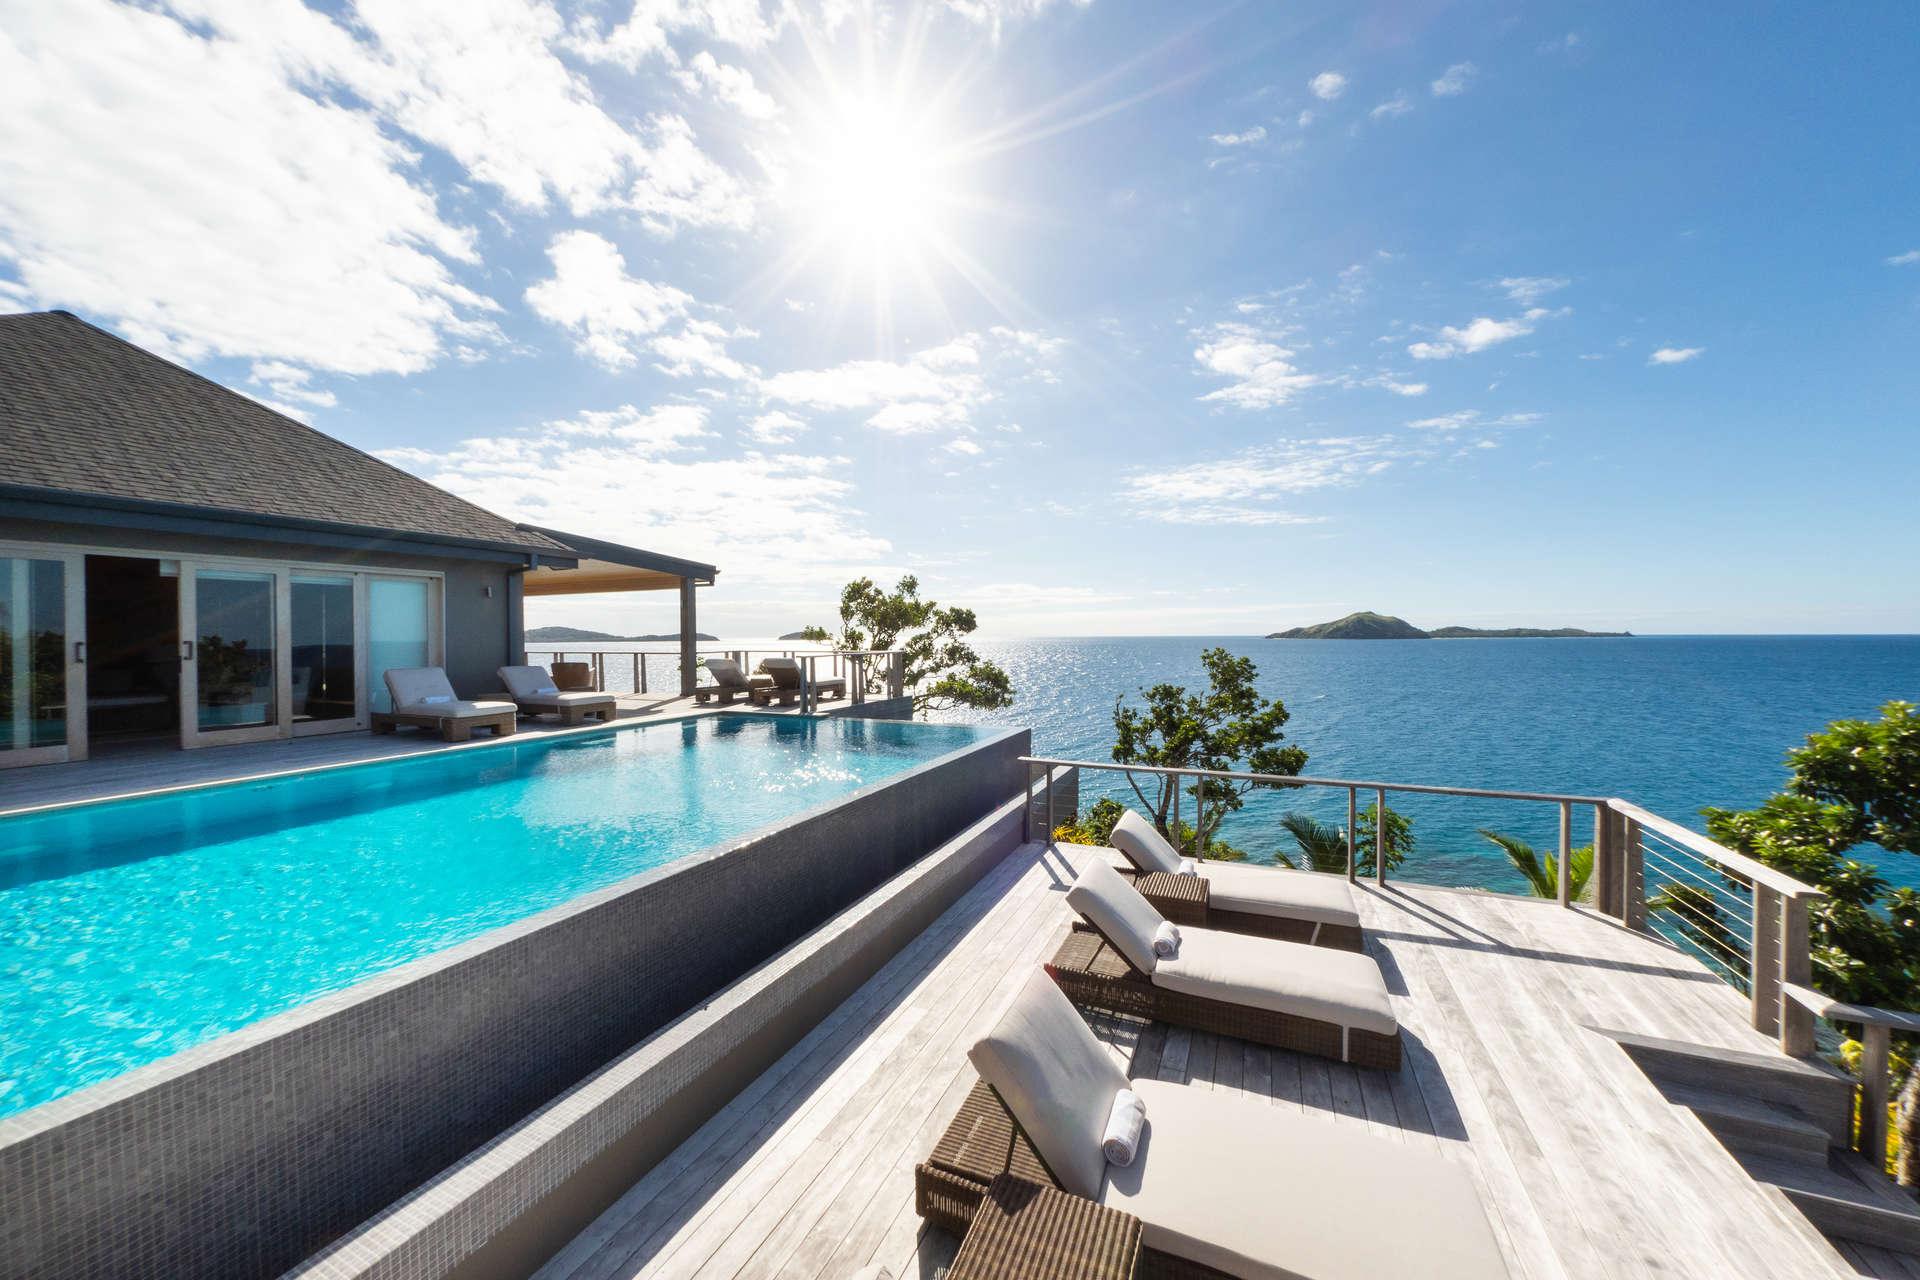 Oceania - Fi ji - Yaukuve levu  island - Kokomo private  island resort - Ocean Luxury Residence - Image 1/15